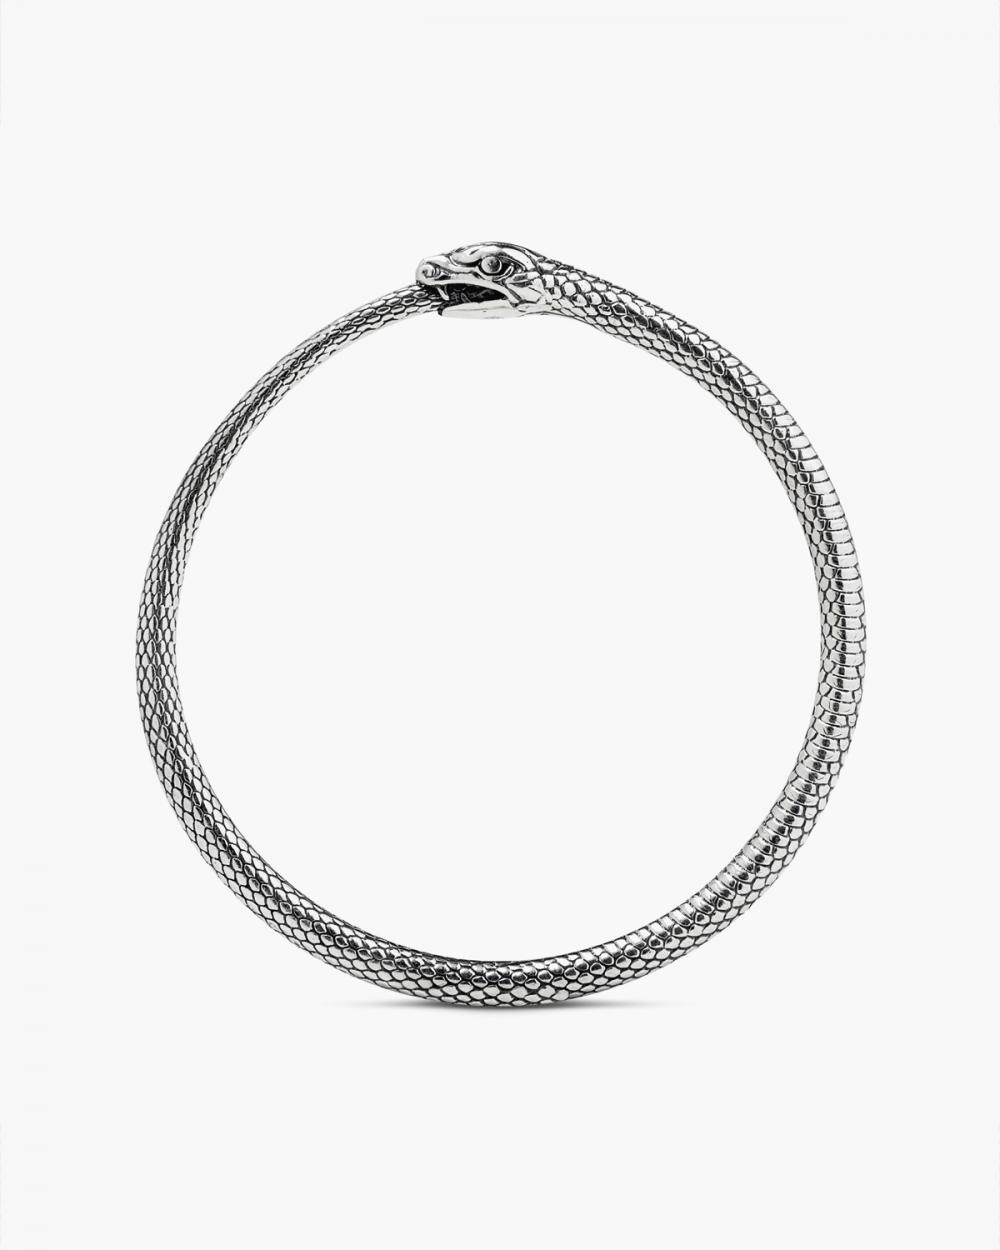 Bracelets SILVER OUROBOROS BRACELET NOVE25